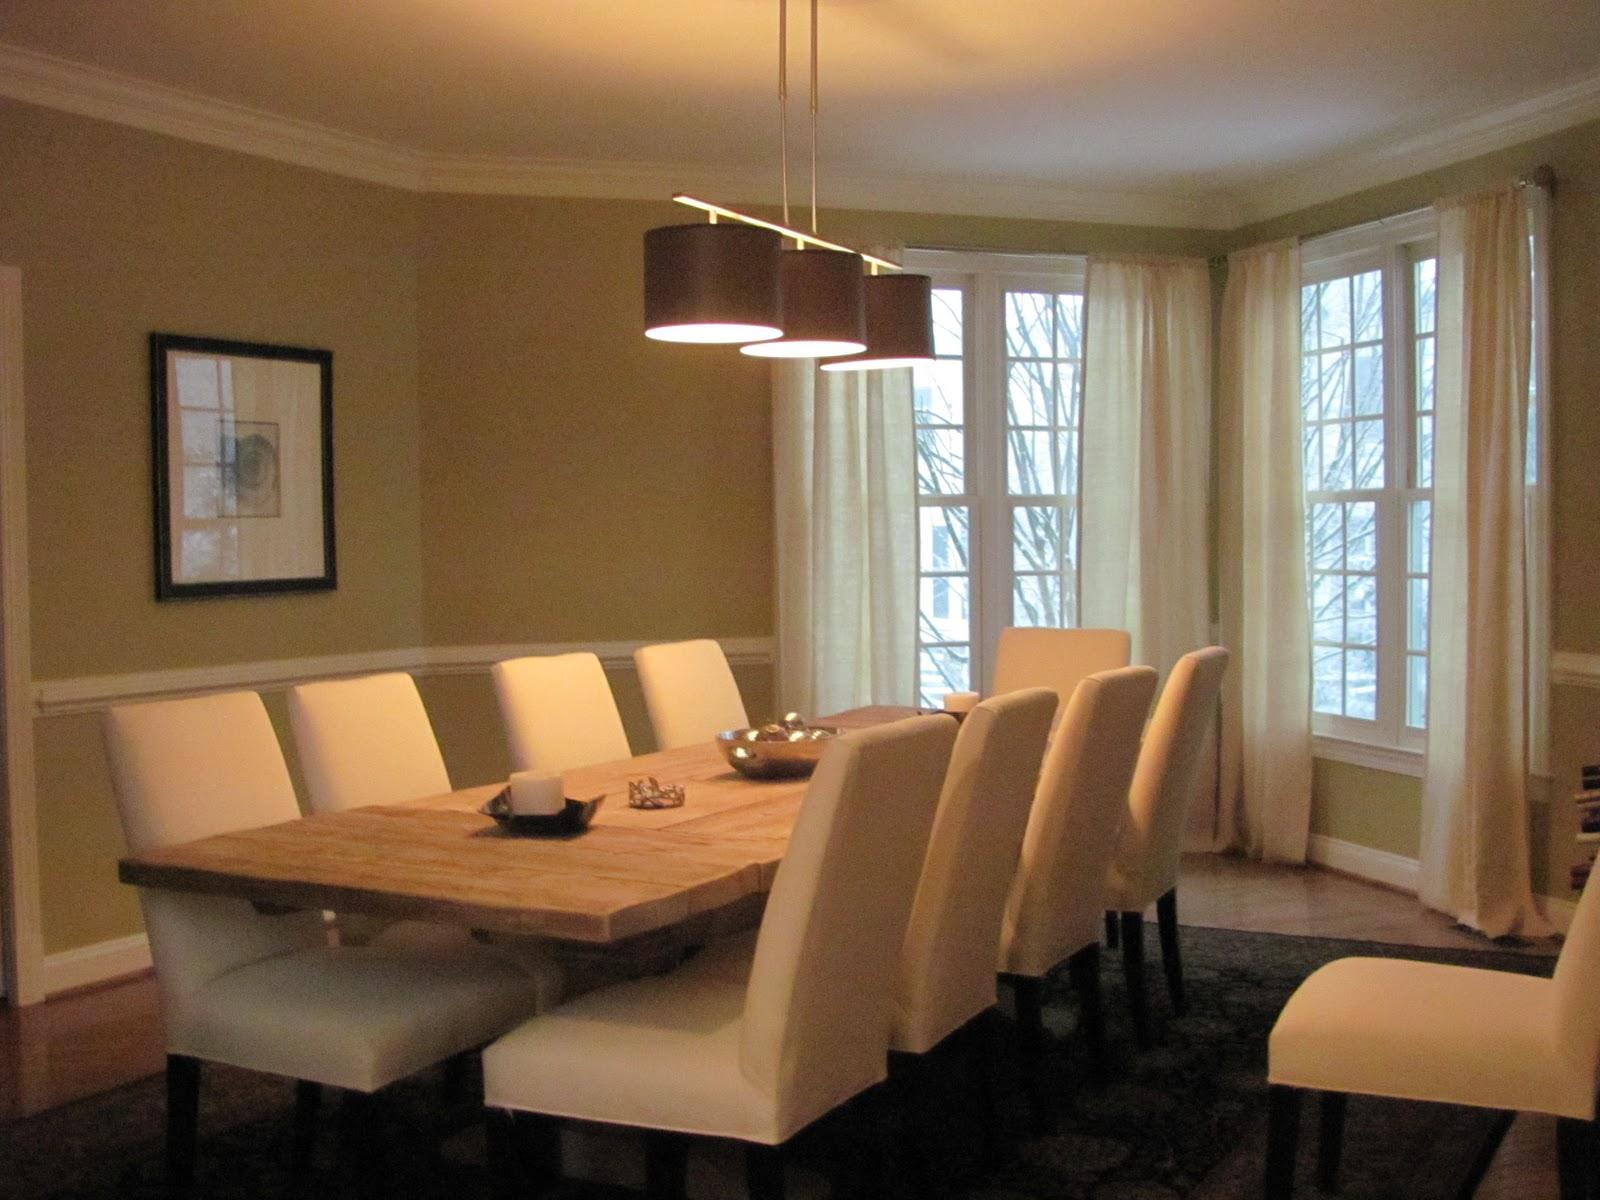 Dining table from Restoration Hardware. Modern 3 Pendant Light